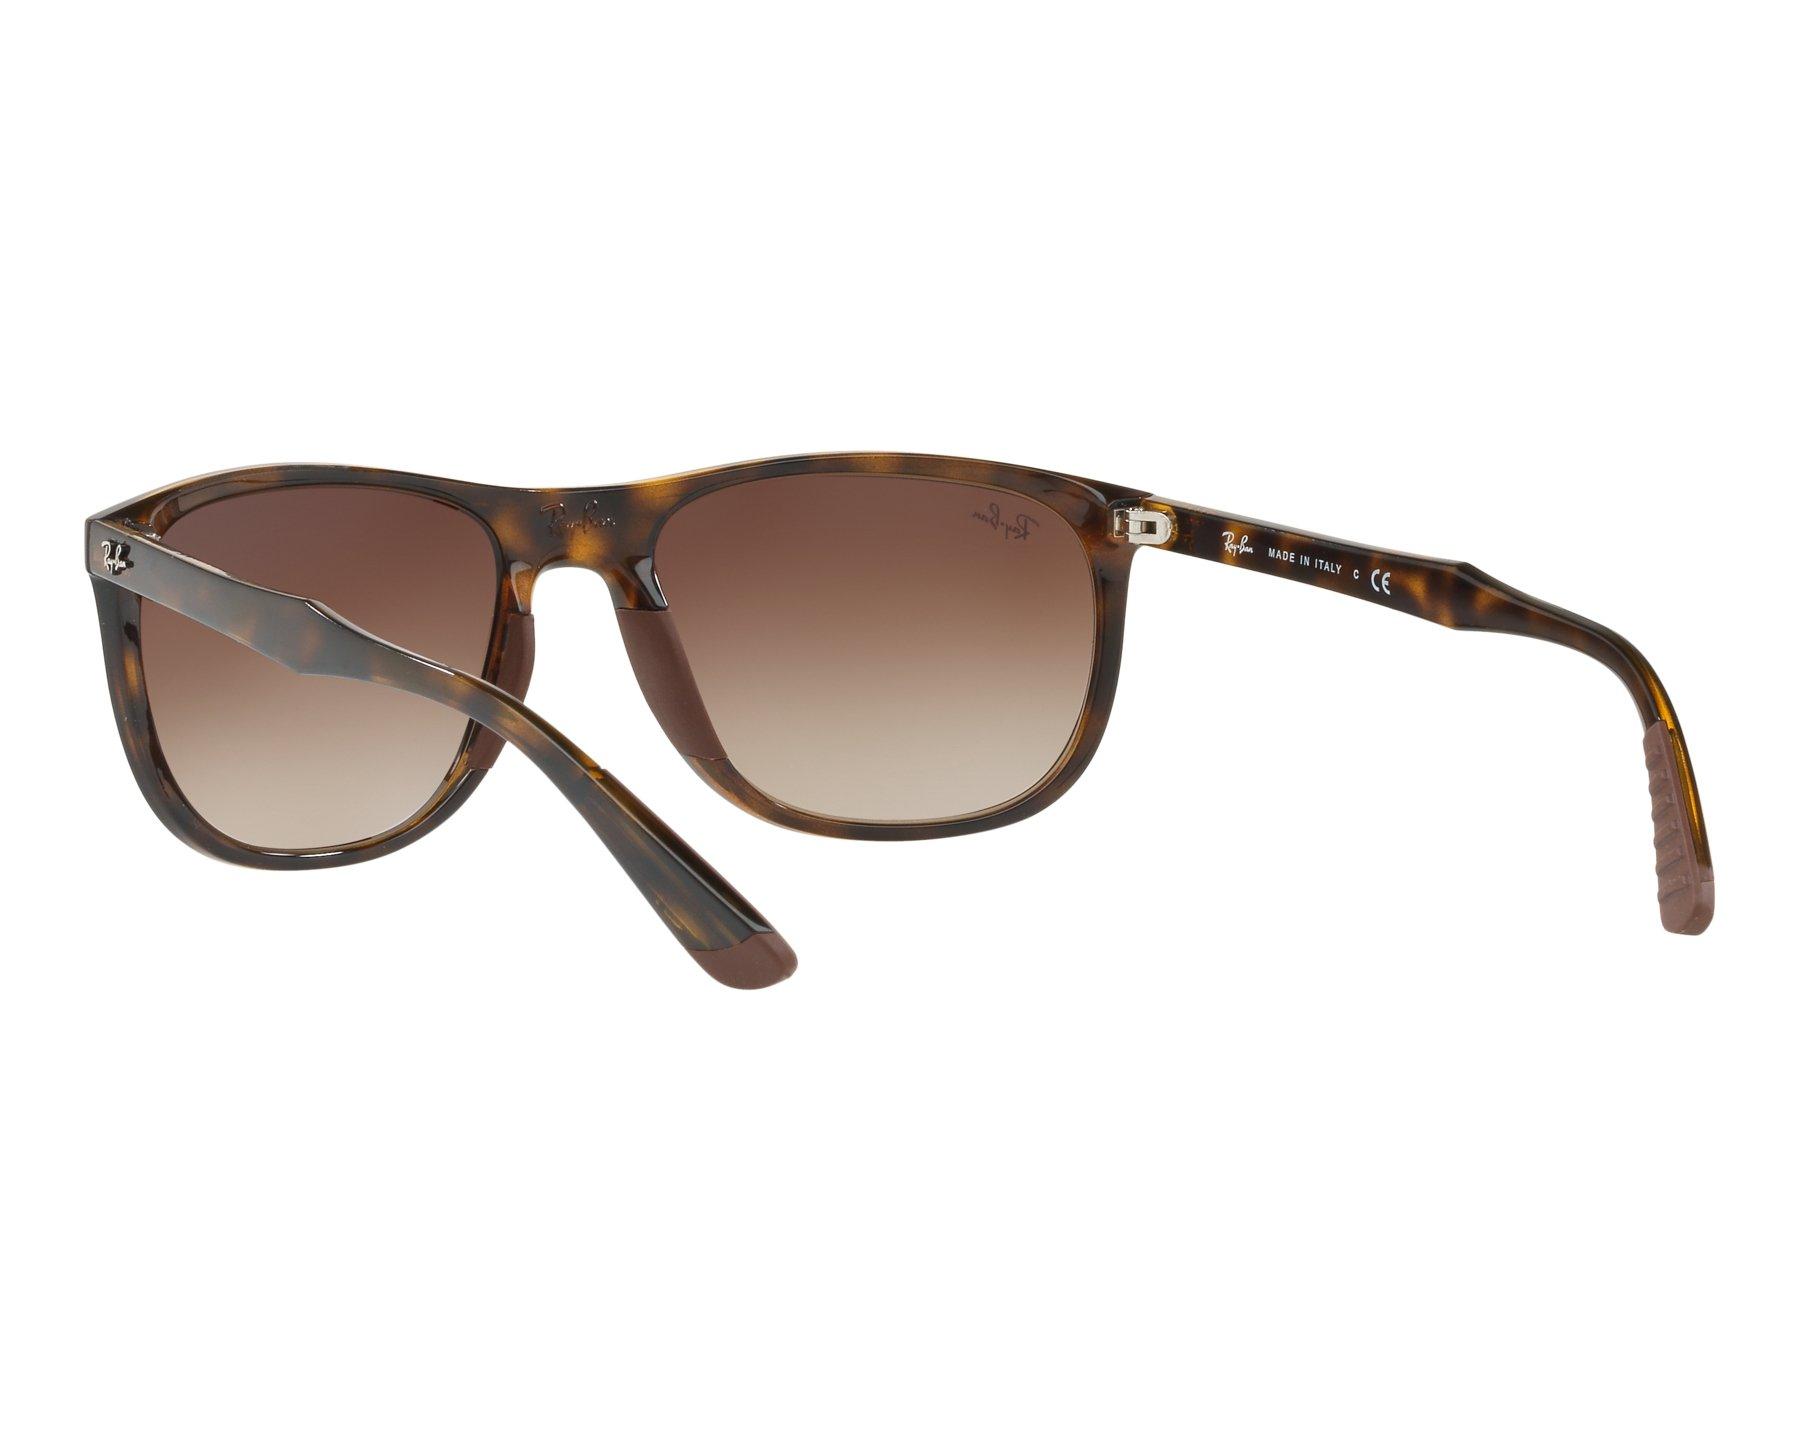 235cb6e68c Sunglasses Ray-Ban RB-4291 710 13 58-19 Havana 360 degree